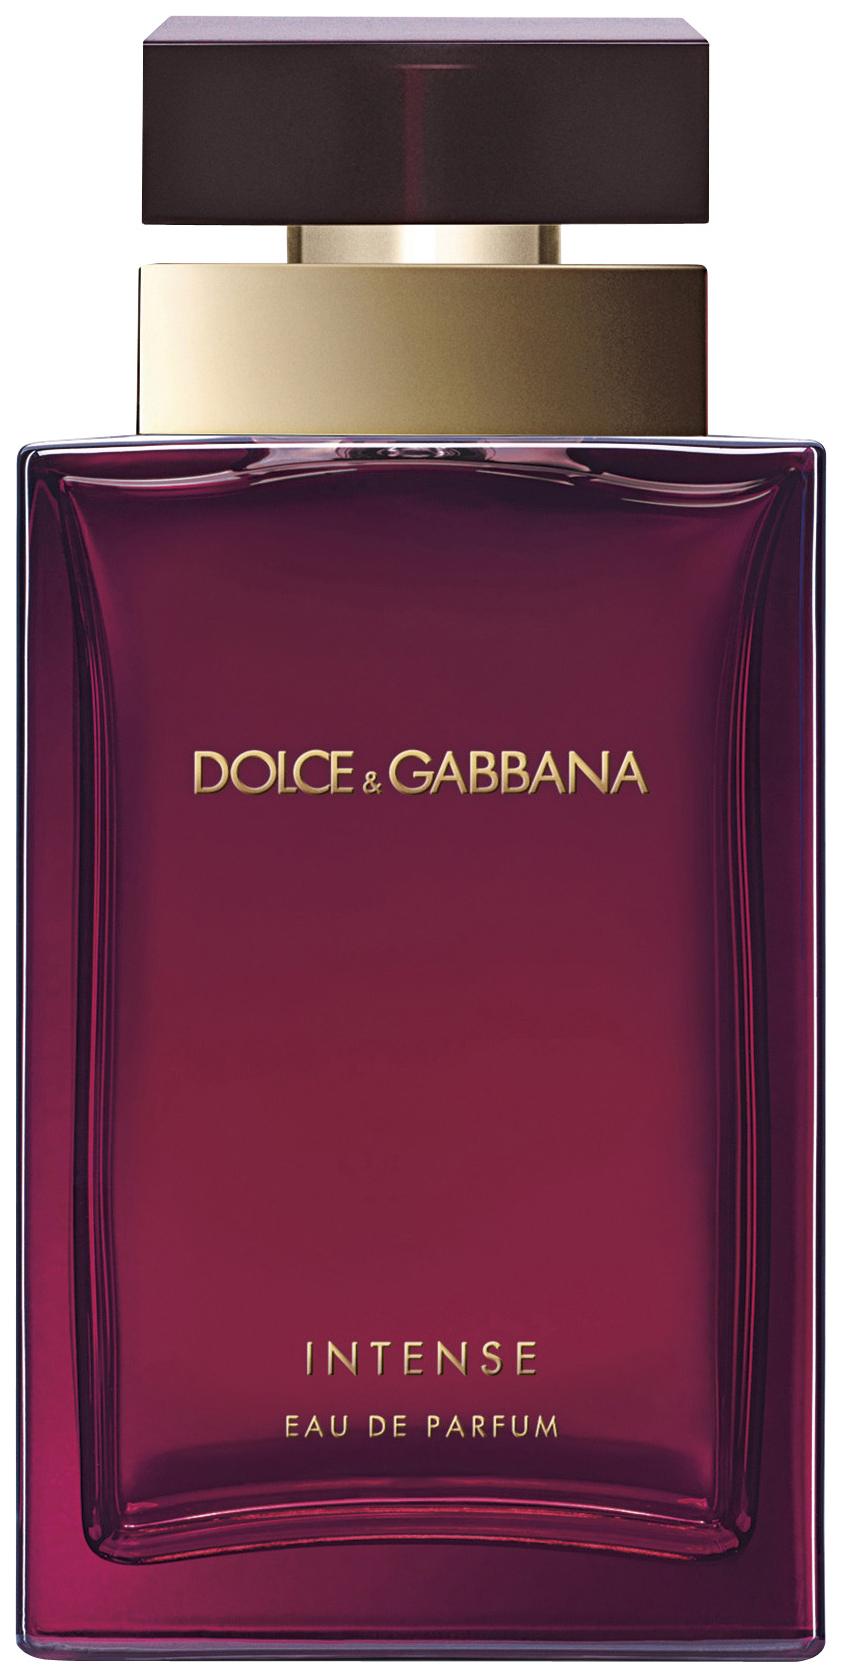 DOLCE AND GABBANA INTENSO